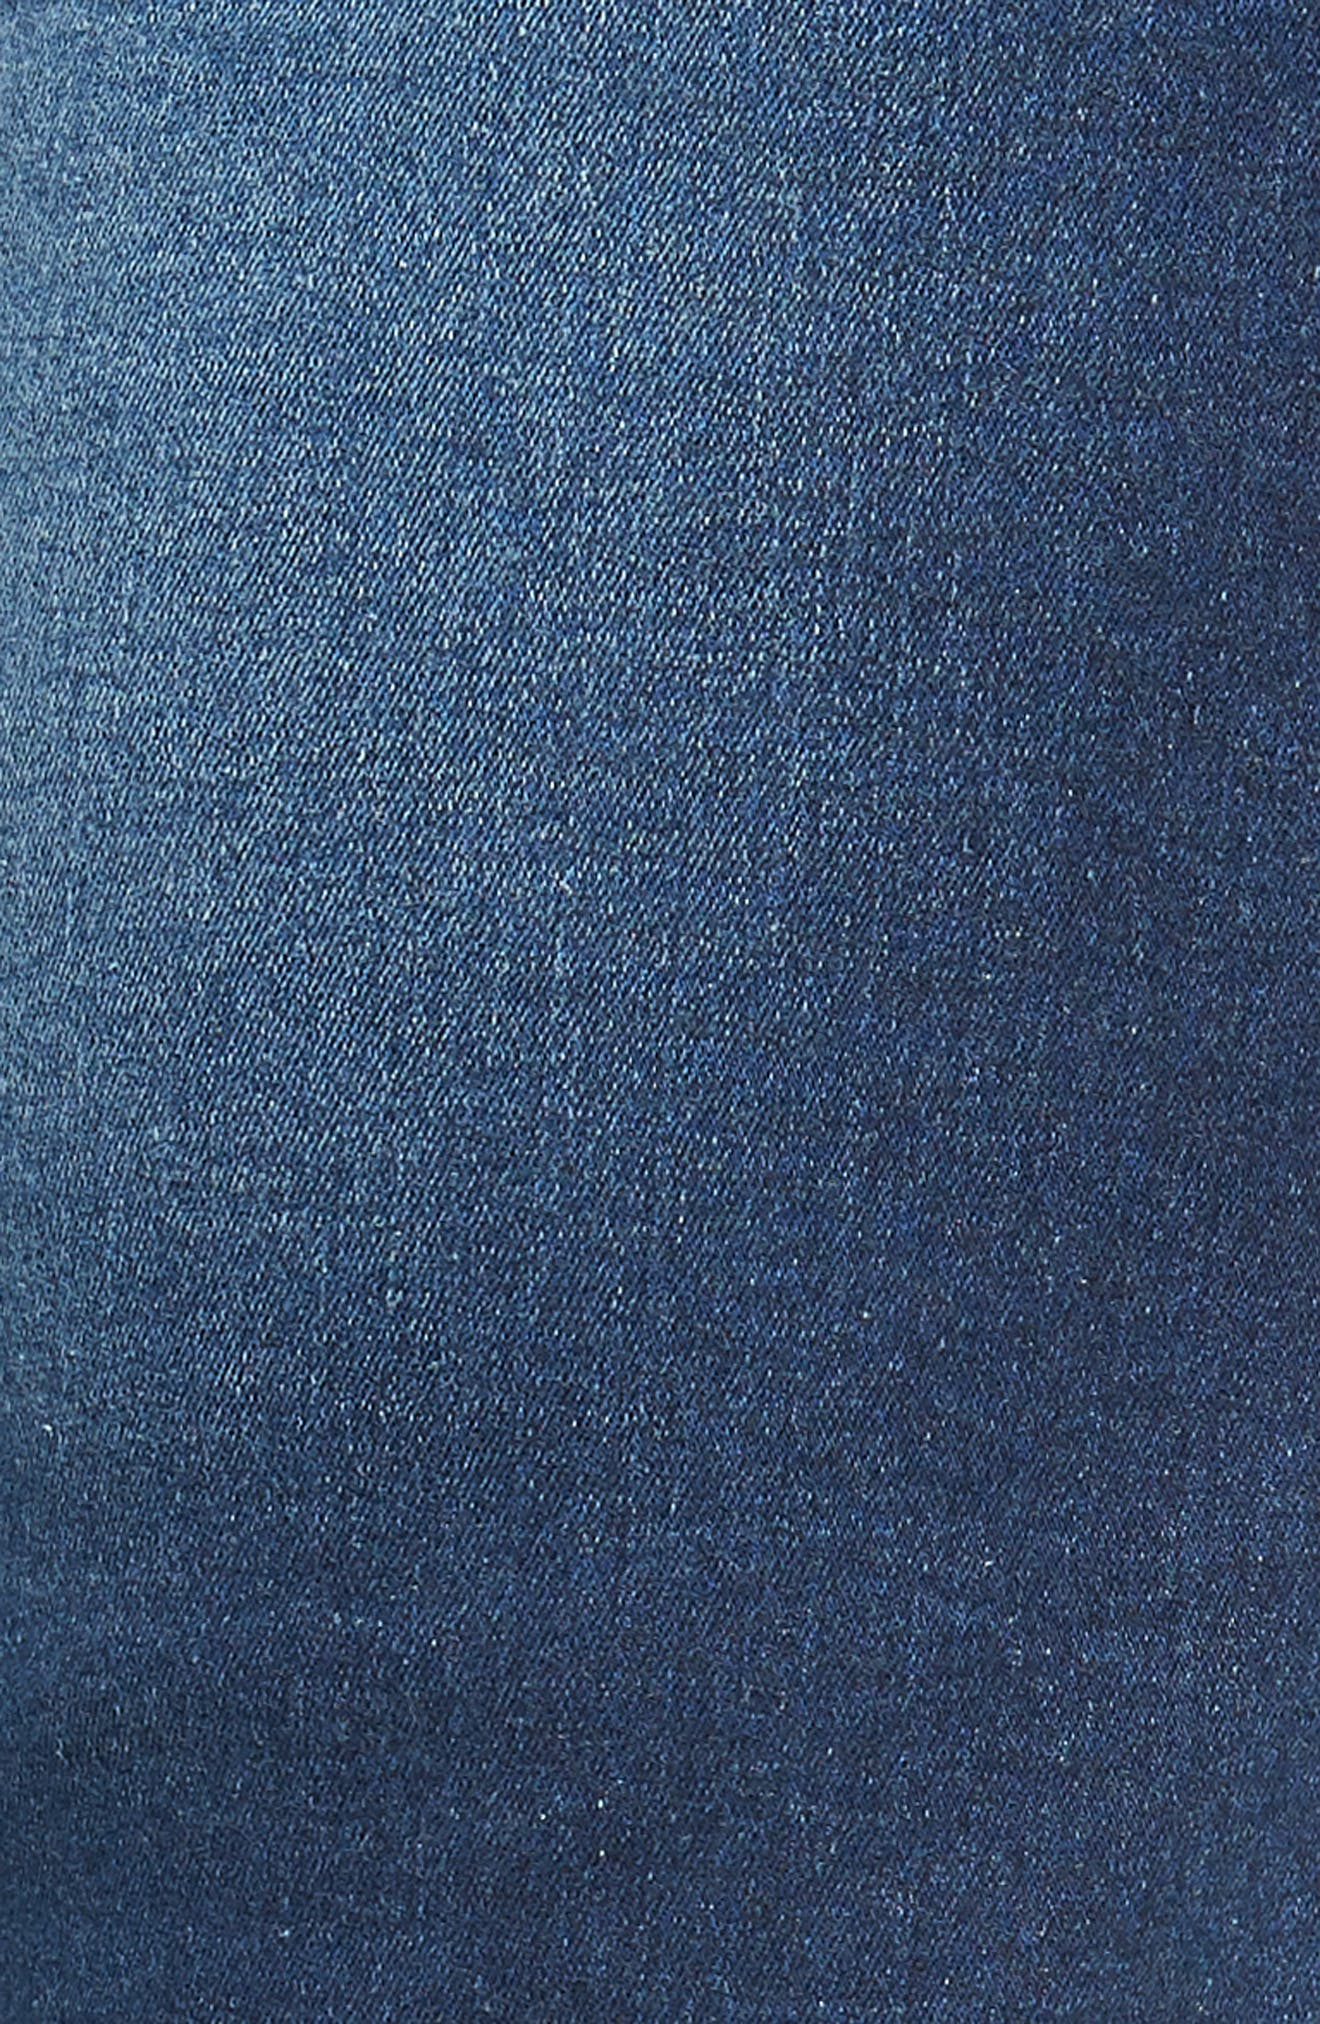 Leroy Skinny Fit Jeans,                             Alternate thumbnail 5, color,                             WORN DARK BLUE